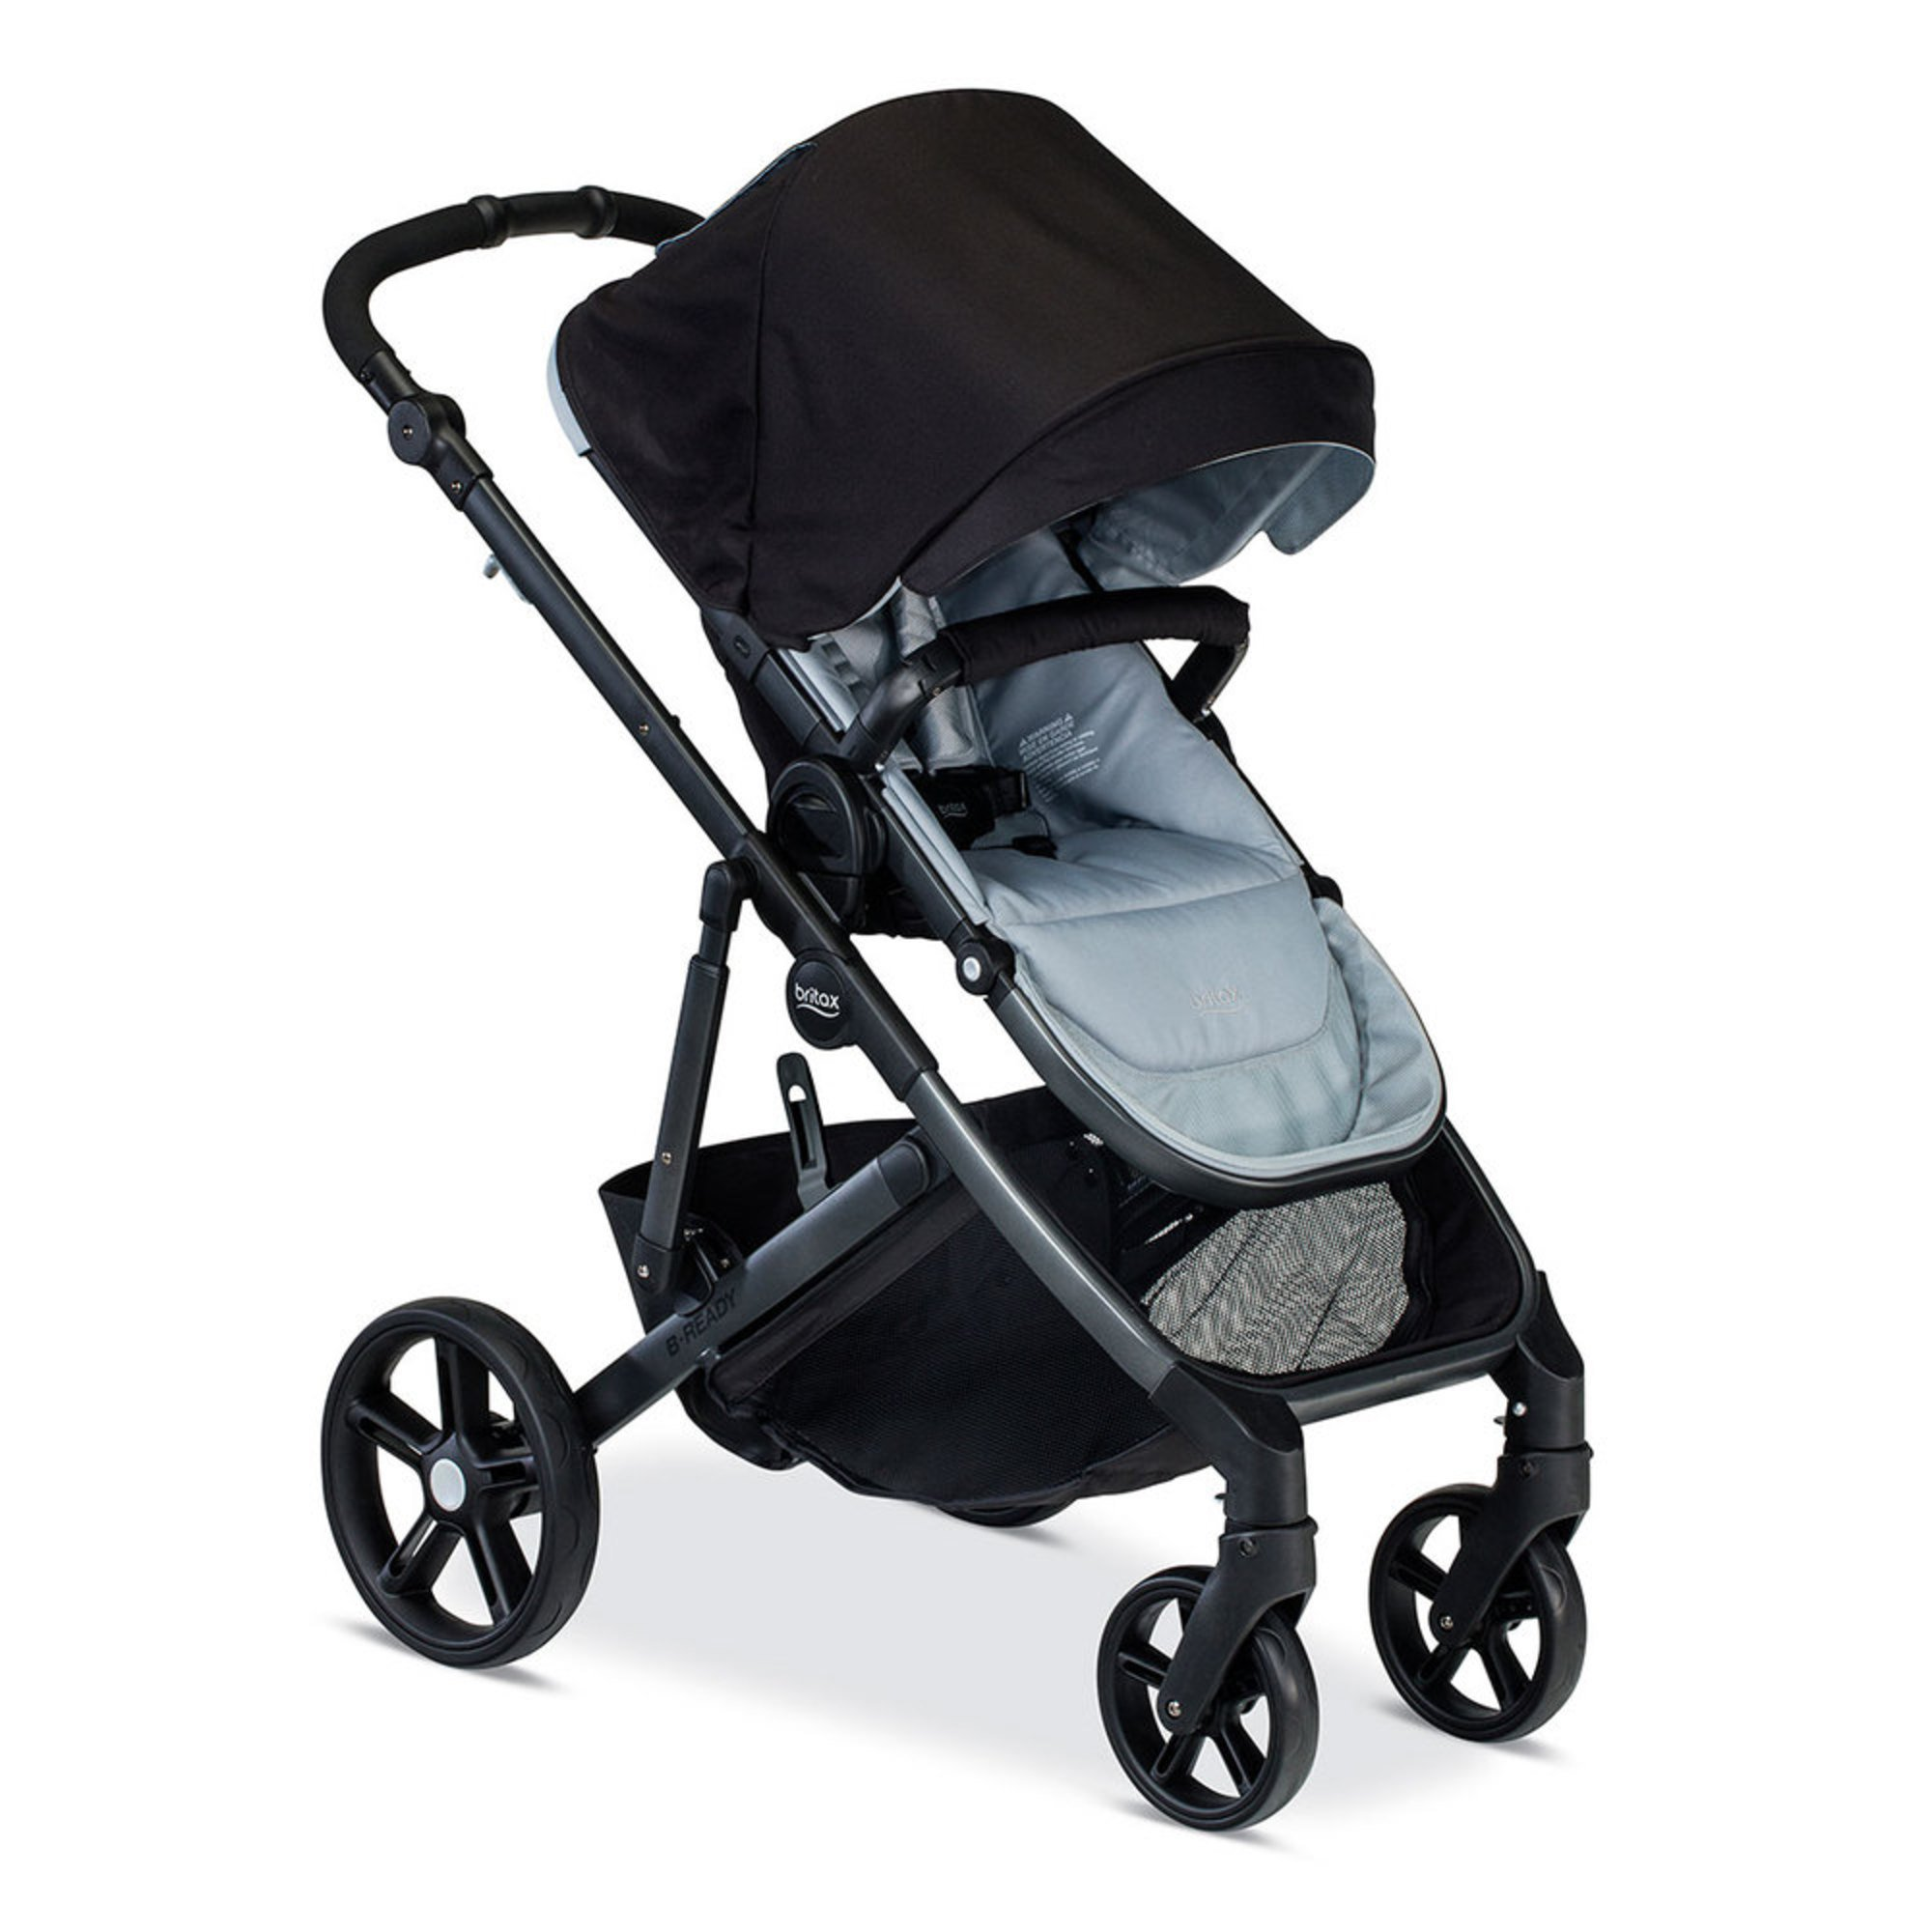 Britax 2017 B-ready Stroller, Mist | Full-size Strollers | Baby ...